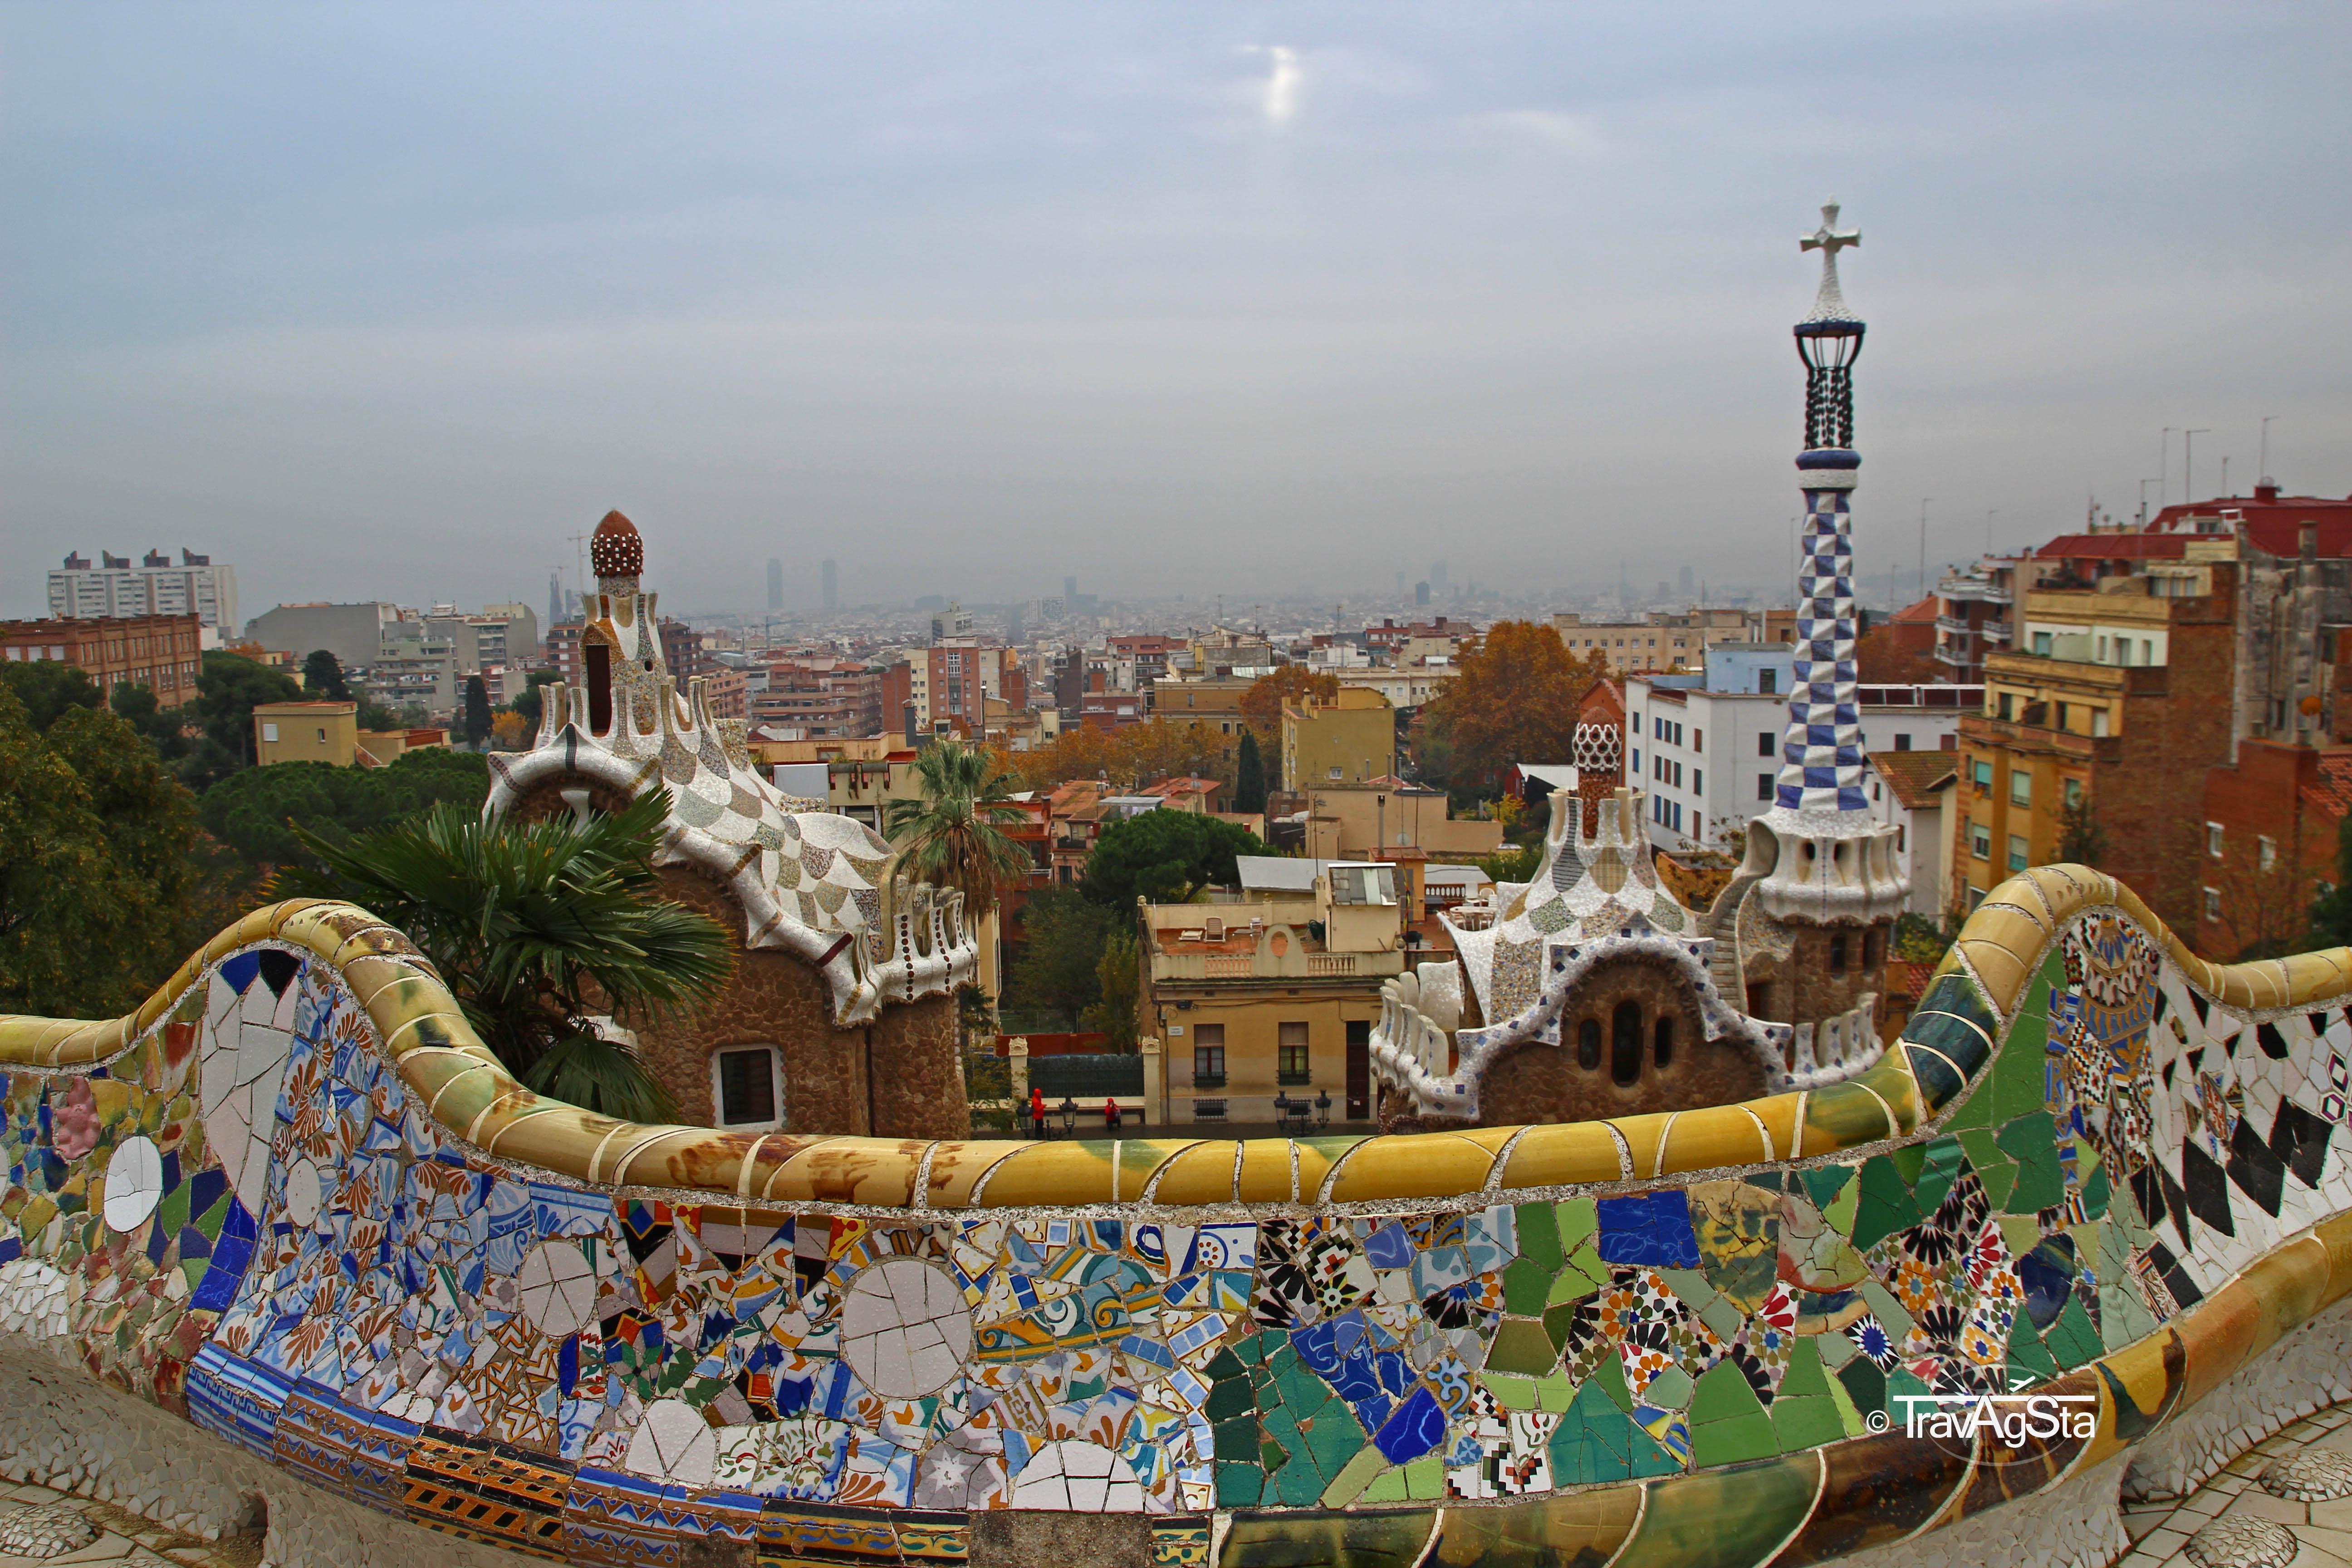 Citytrip to Barcelona – Gaudí, Iberico & a little bit of Christmas! Part 1